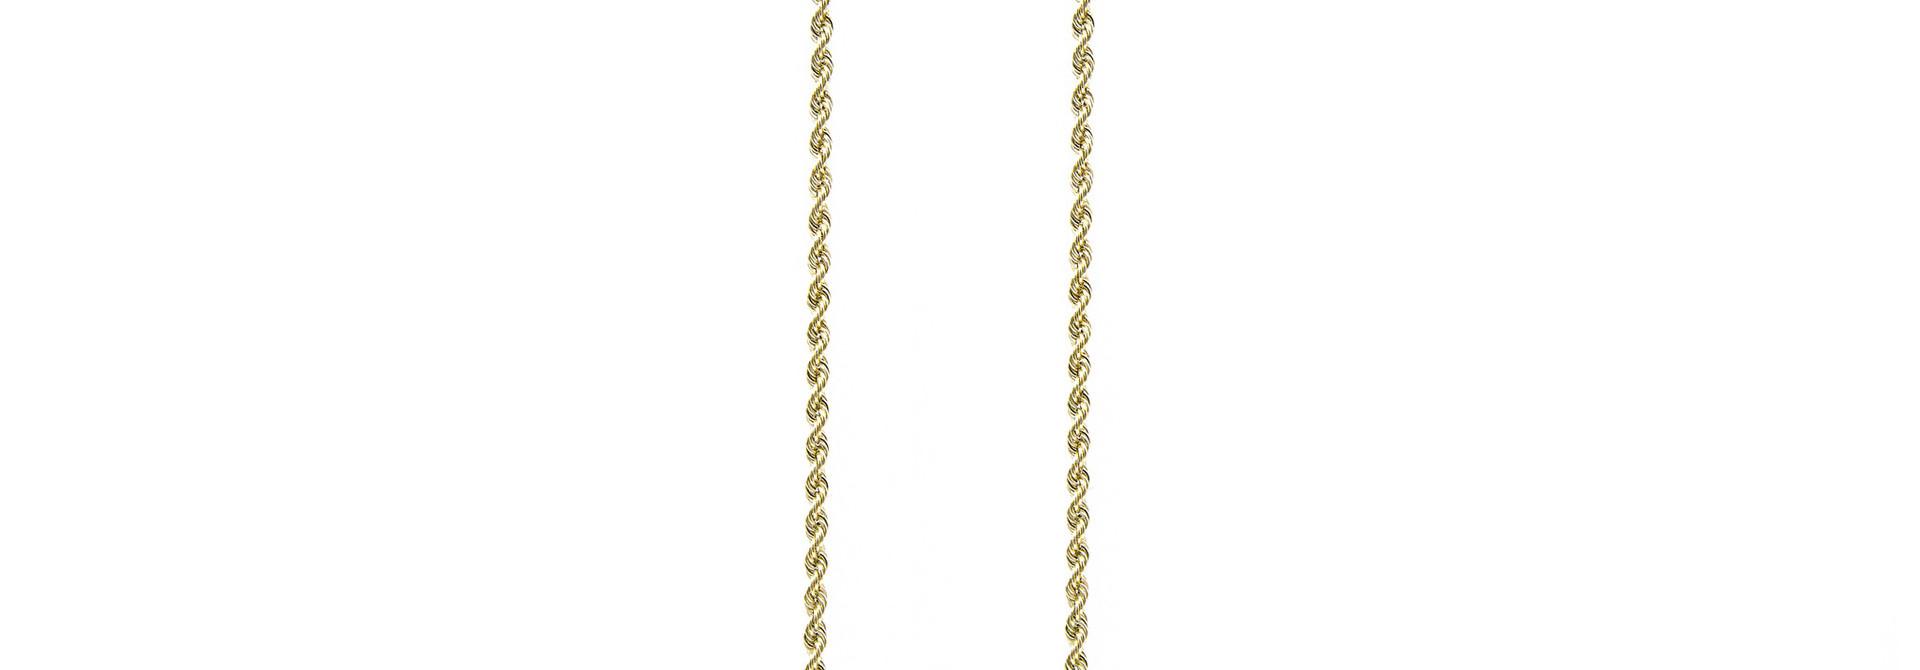 Rope chain ketting massief goud 14 kt 2.5 mm